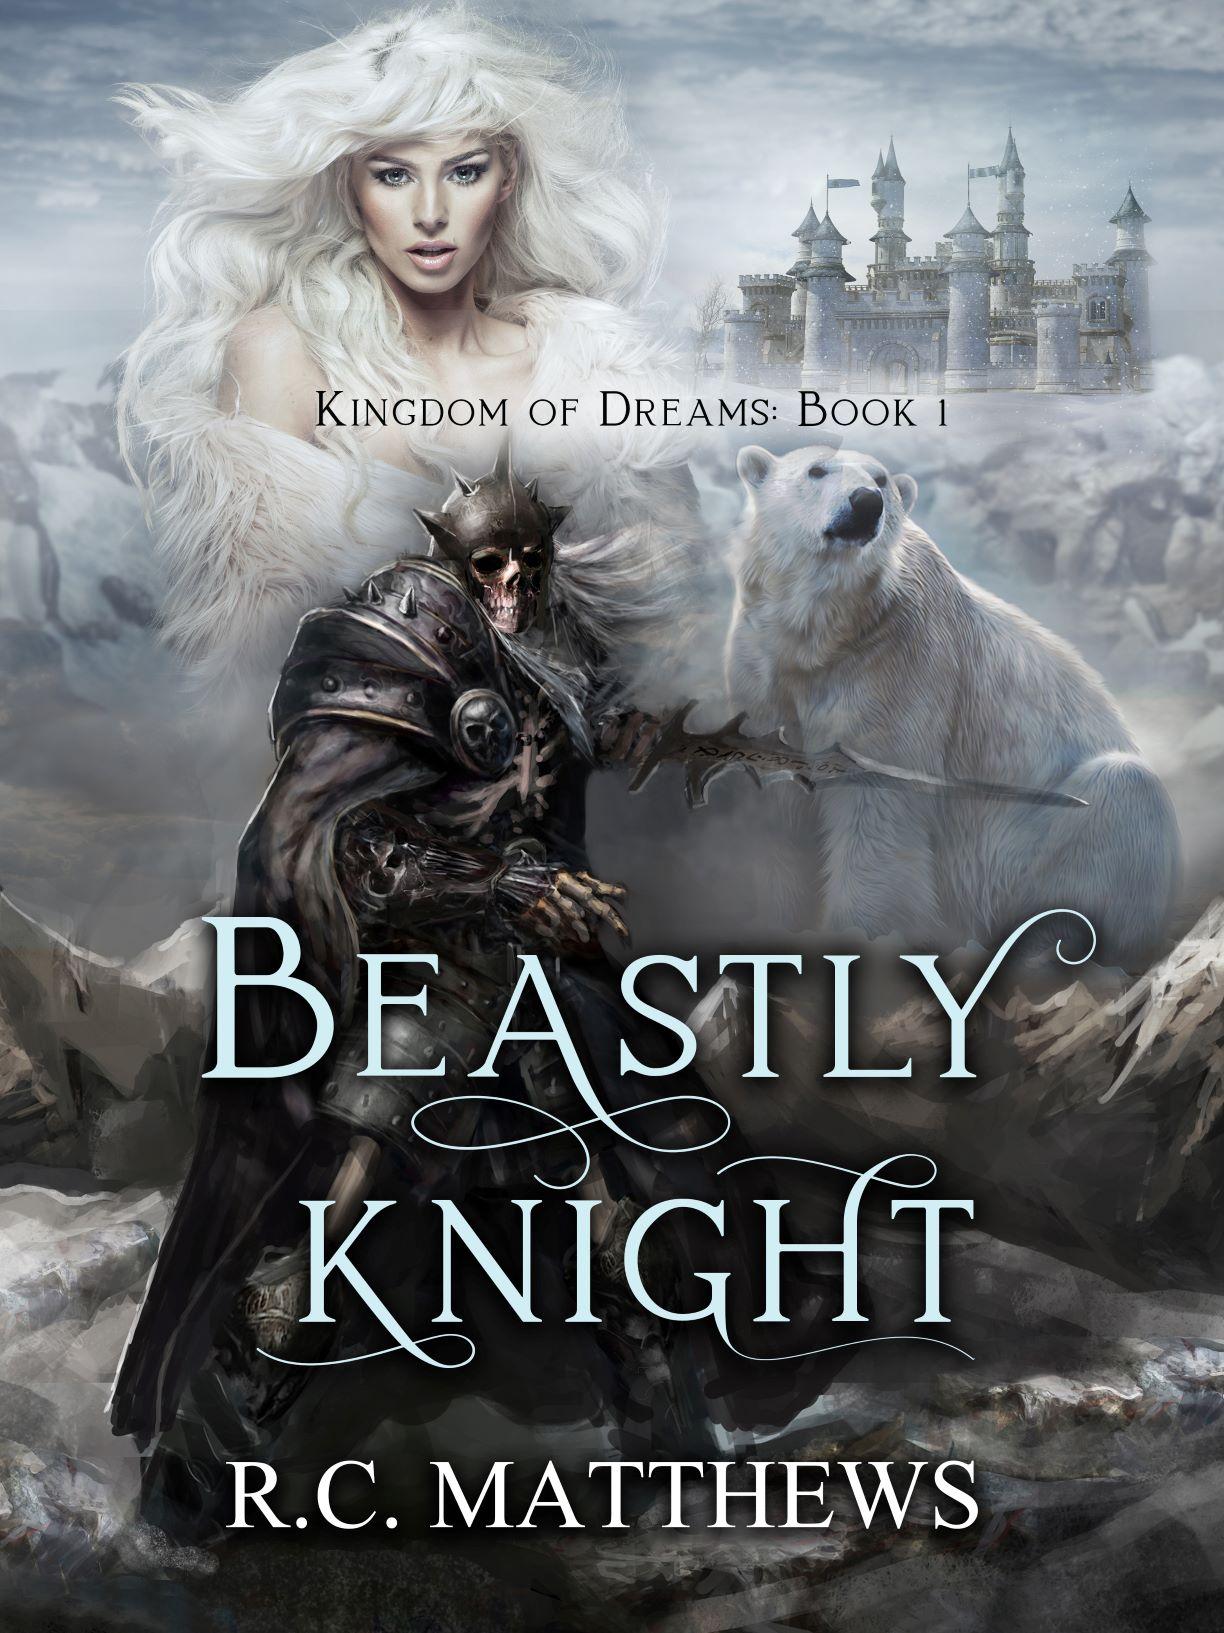 Beastly Knight